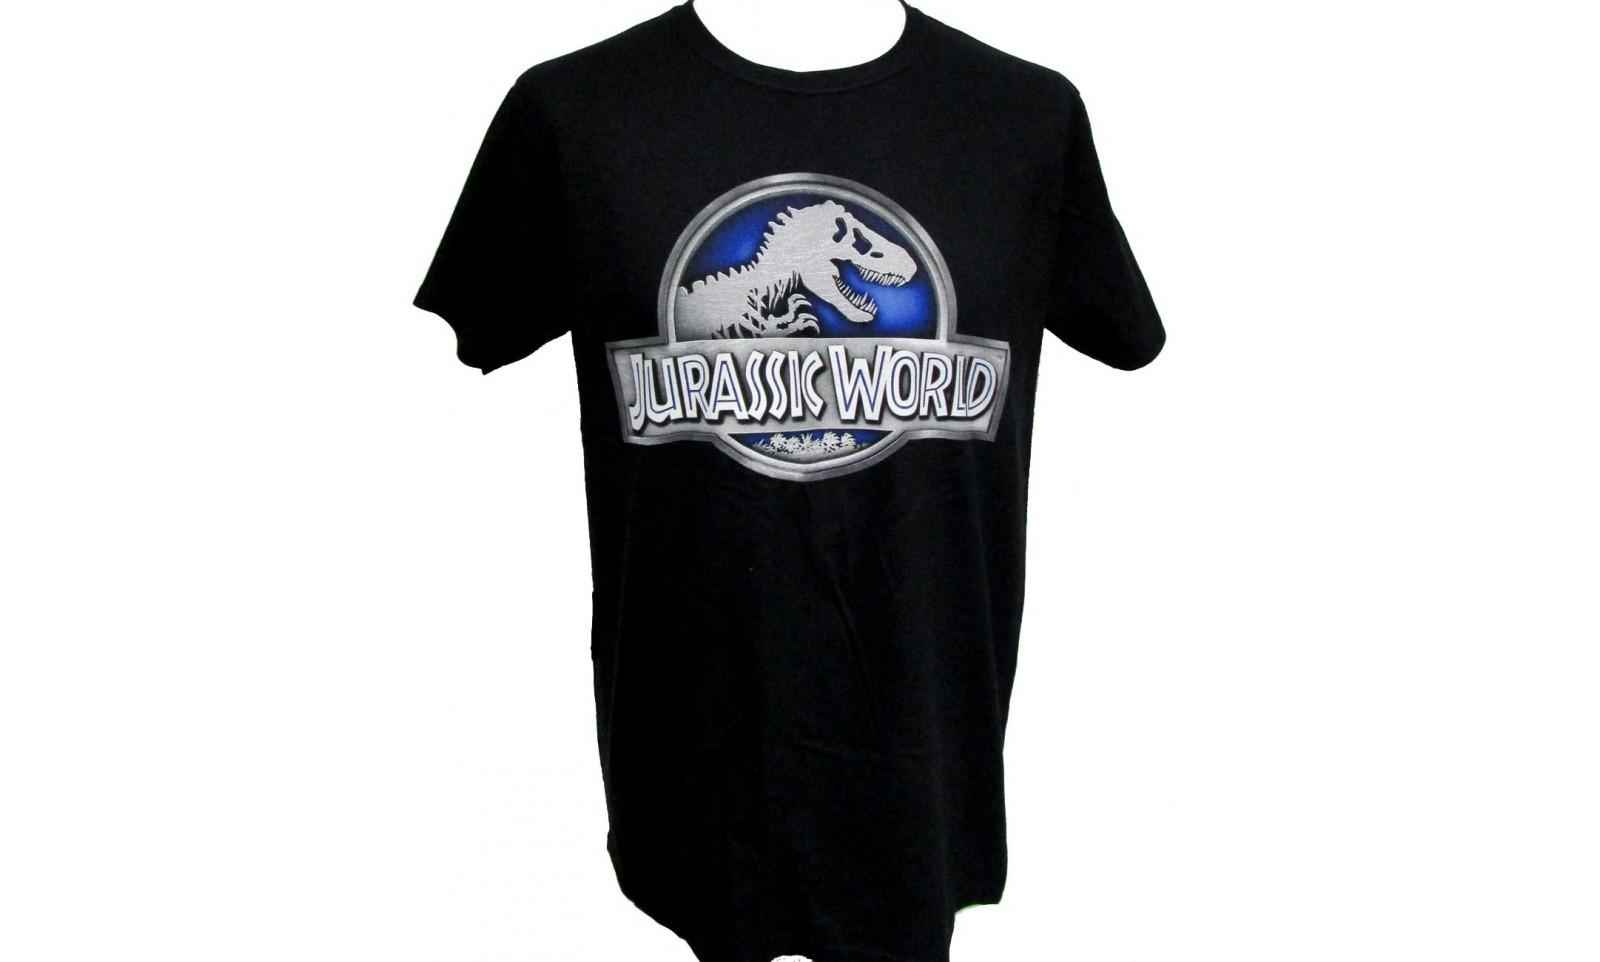 Jurassic world jurassic world logo t shirt movie film for Logo dress shirts no minimum